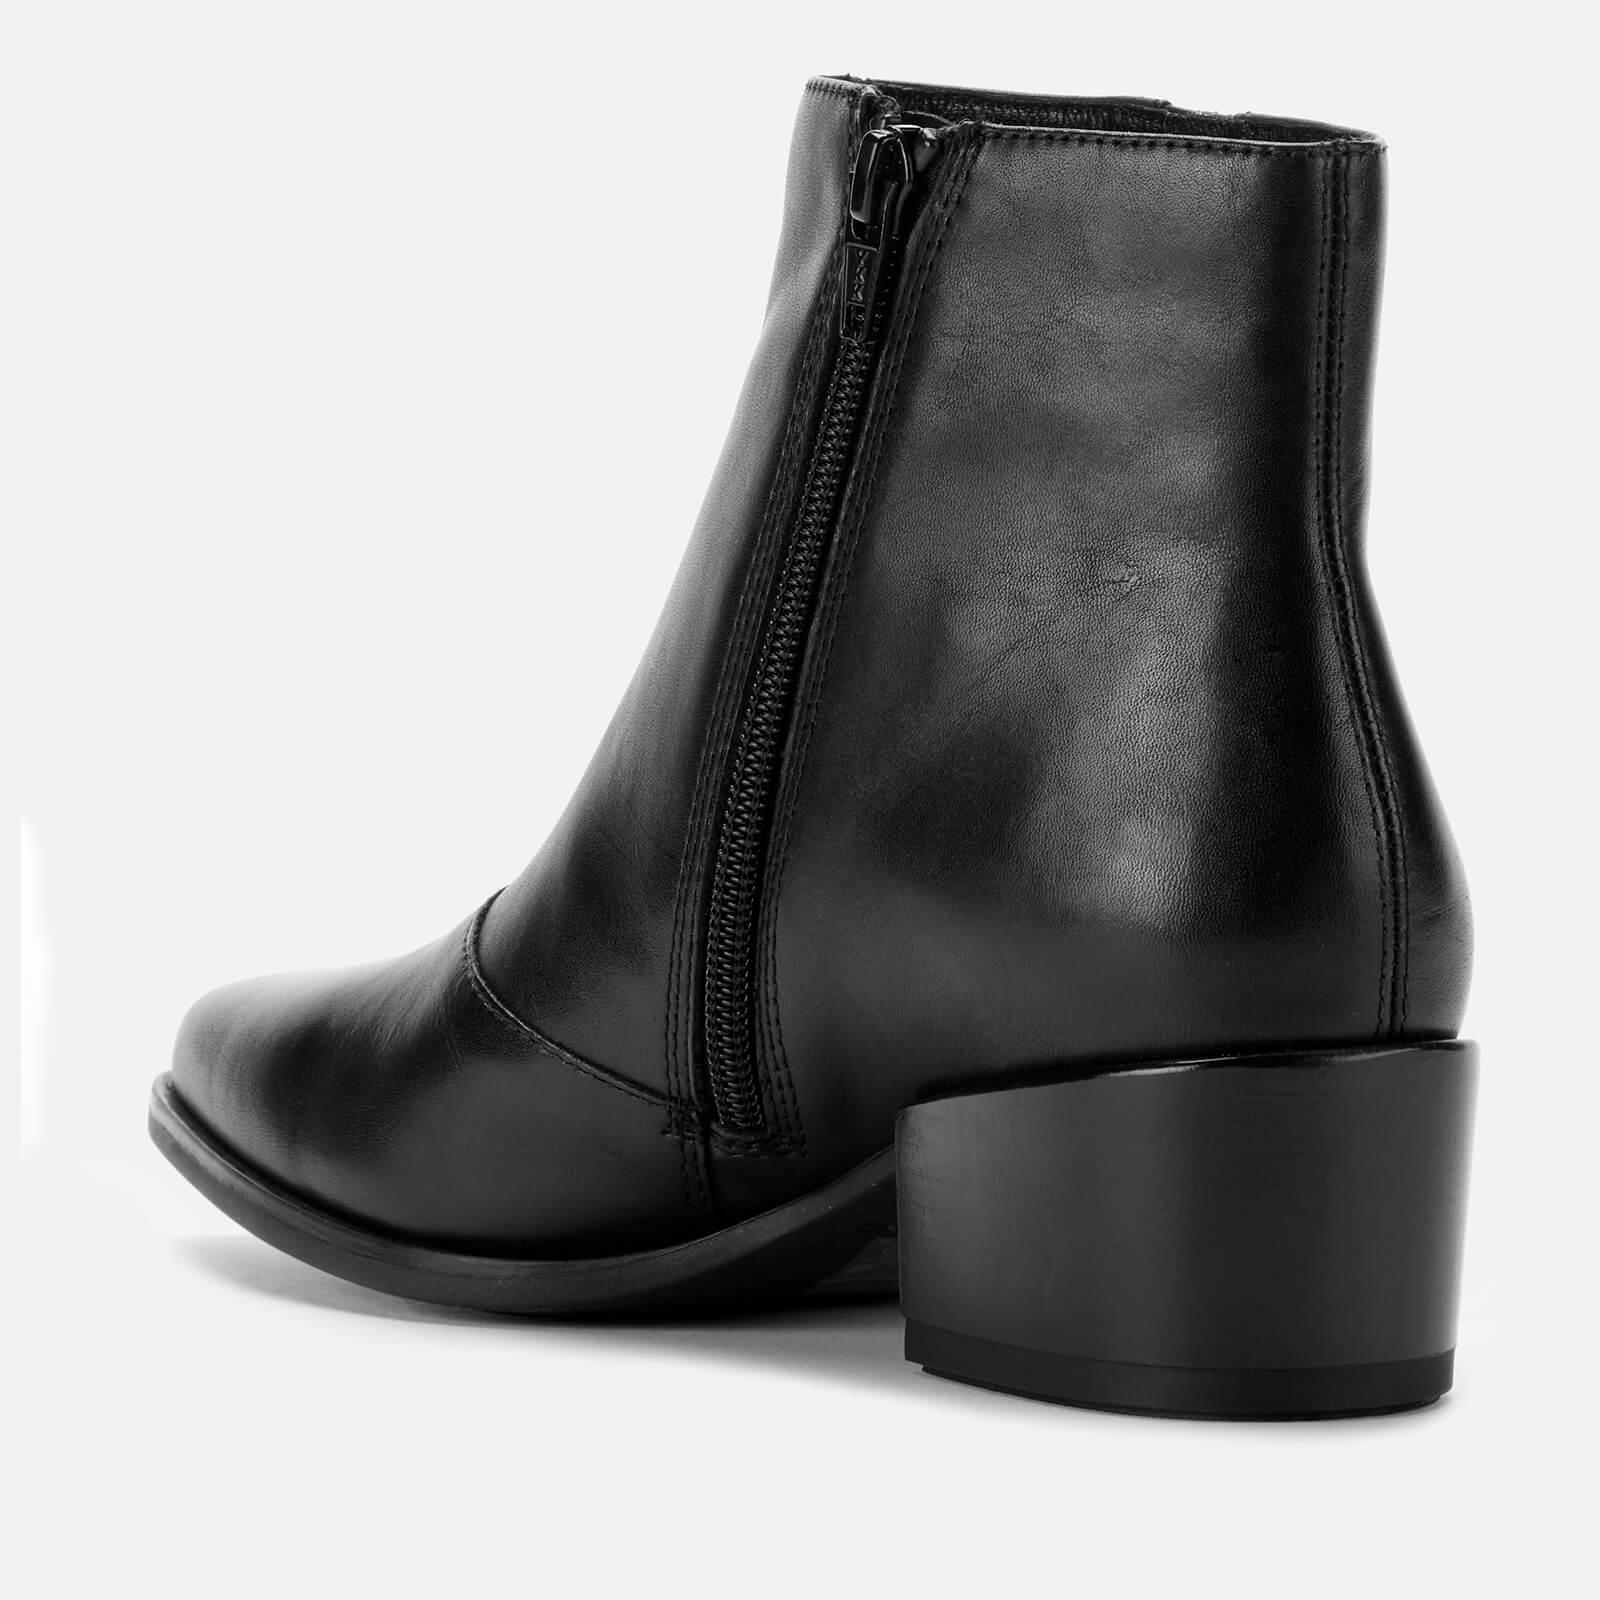 Vagabond Women's Marja Leather Heeled Ankle Boots - Black - Uk 3 - Black